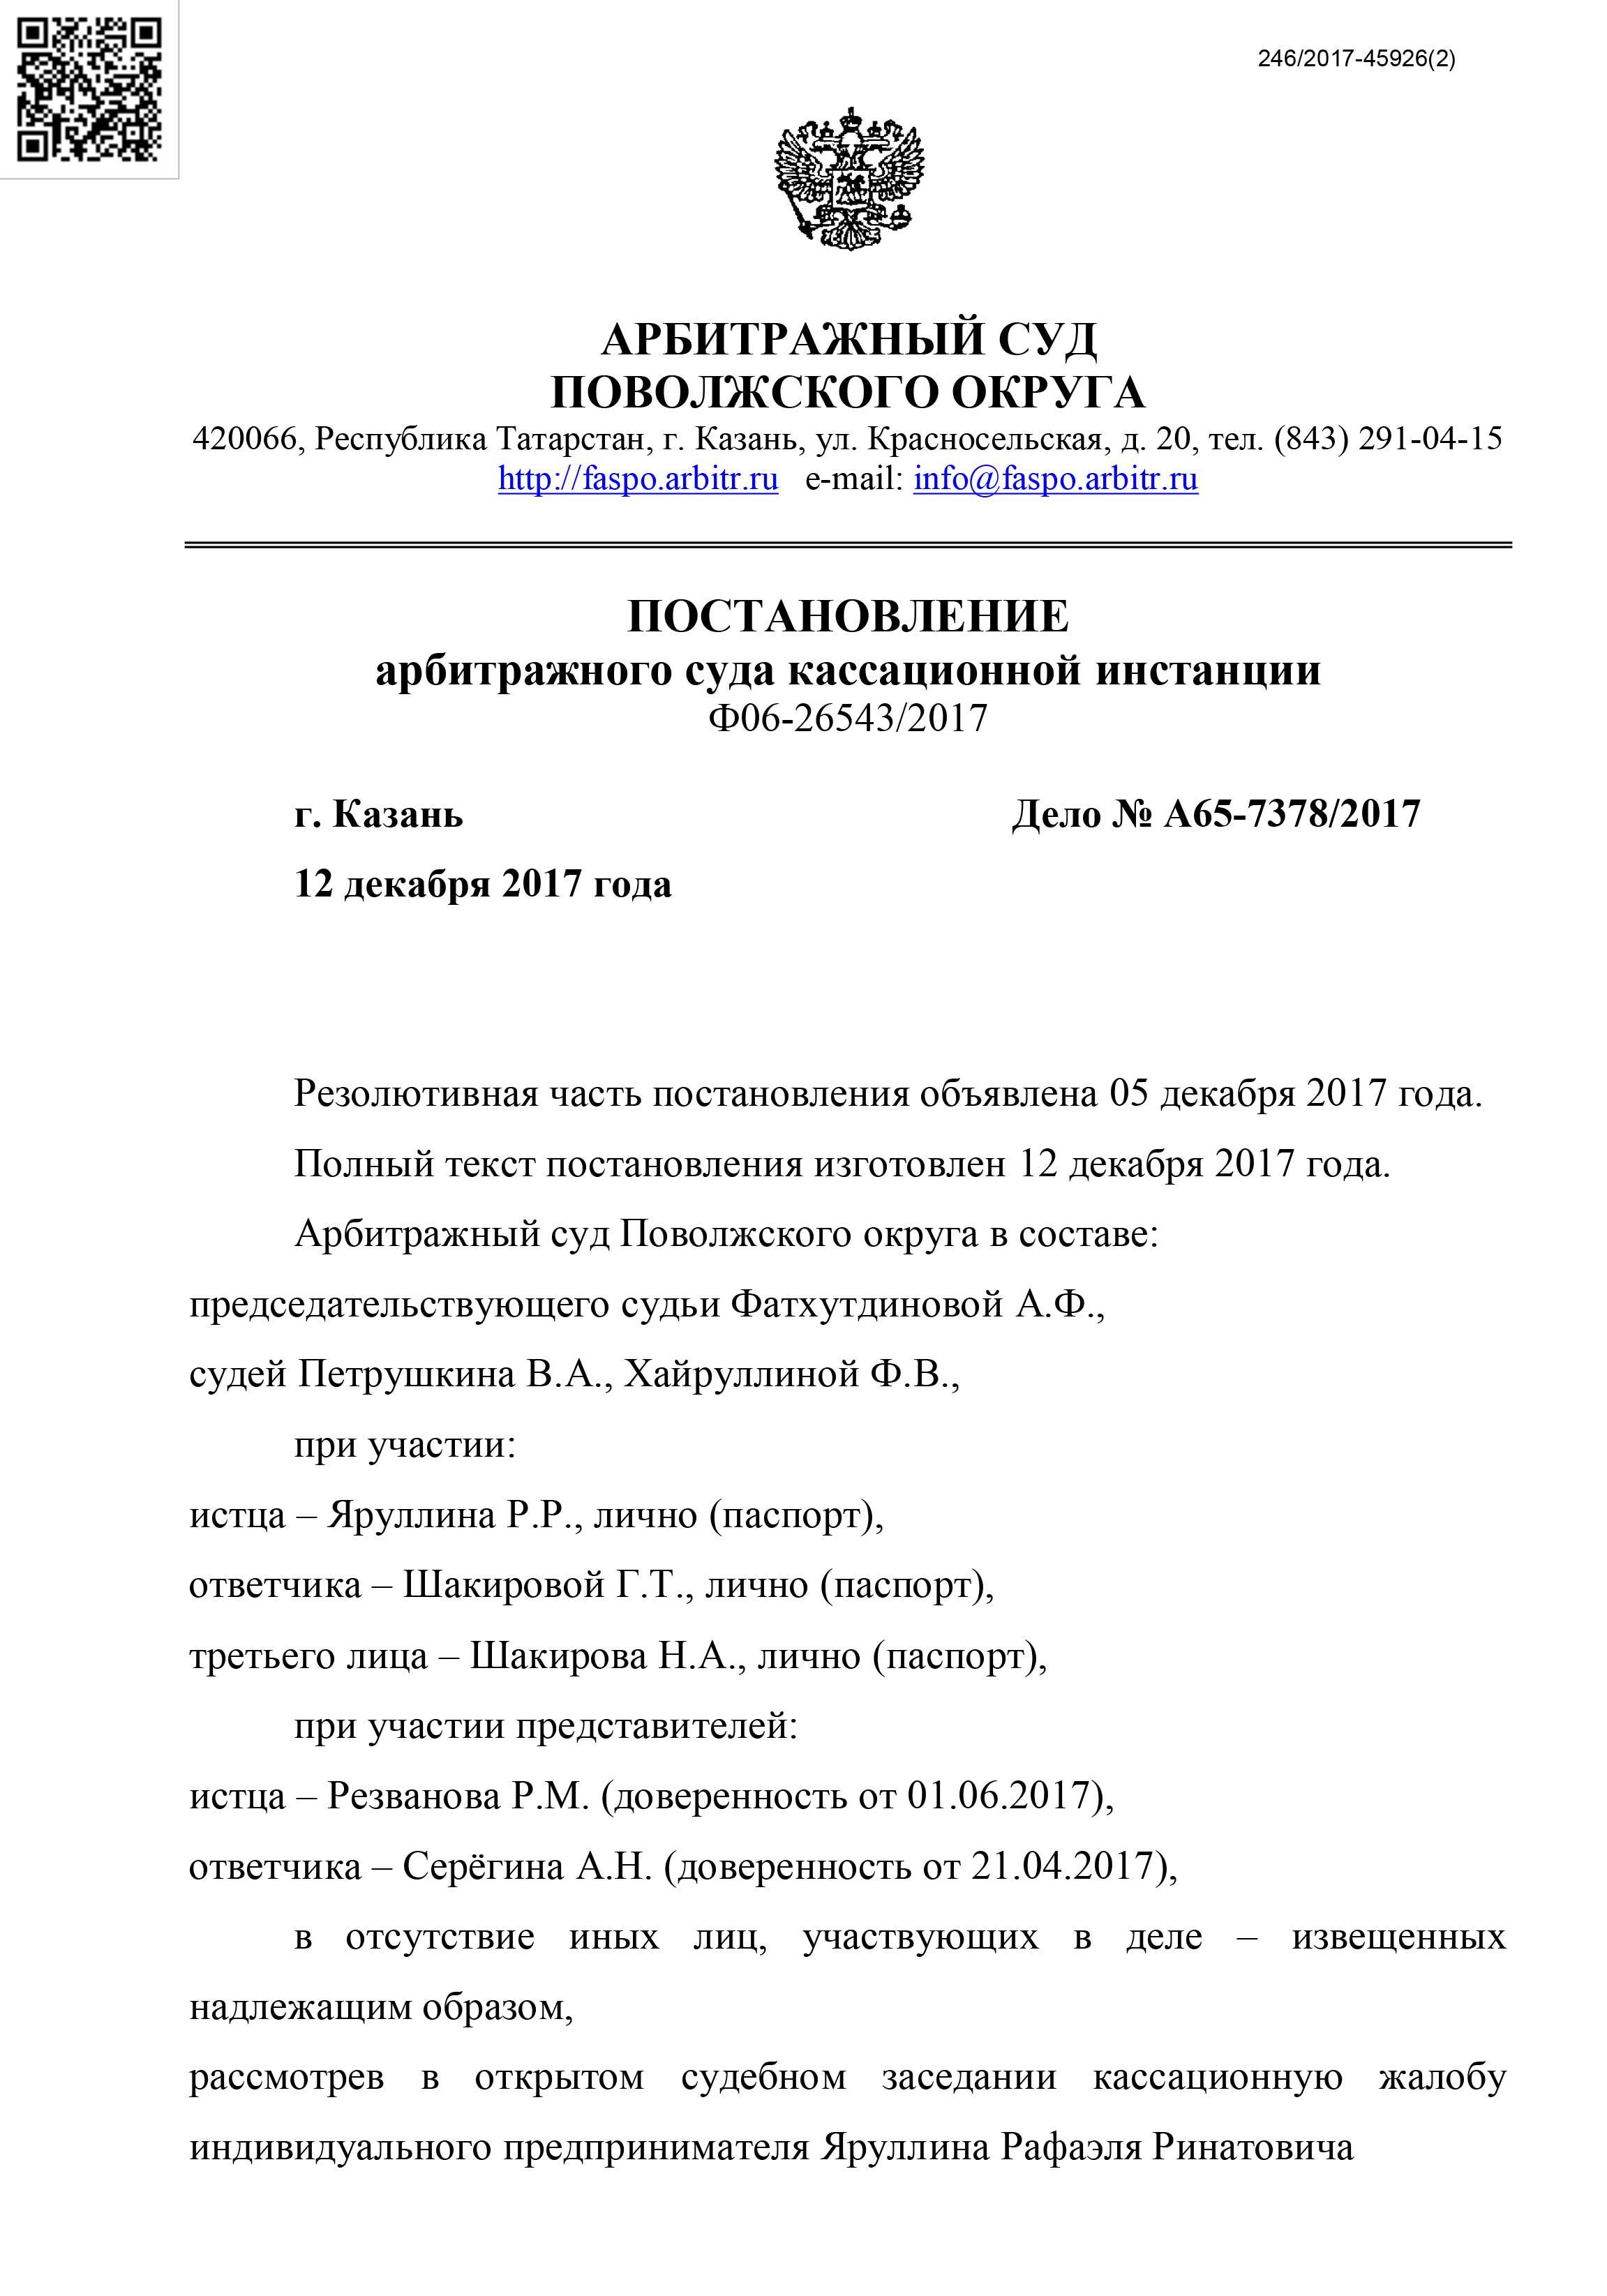 A65-7378-2017_20171212_Postanovlenie_kassacionnoj_instancii-1